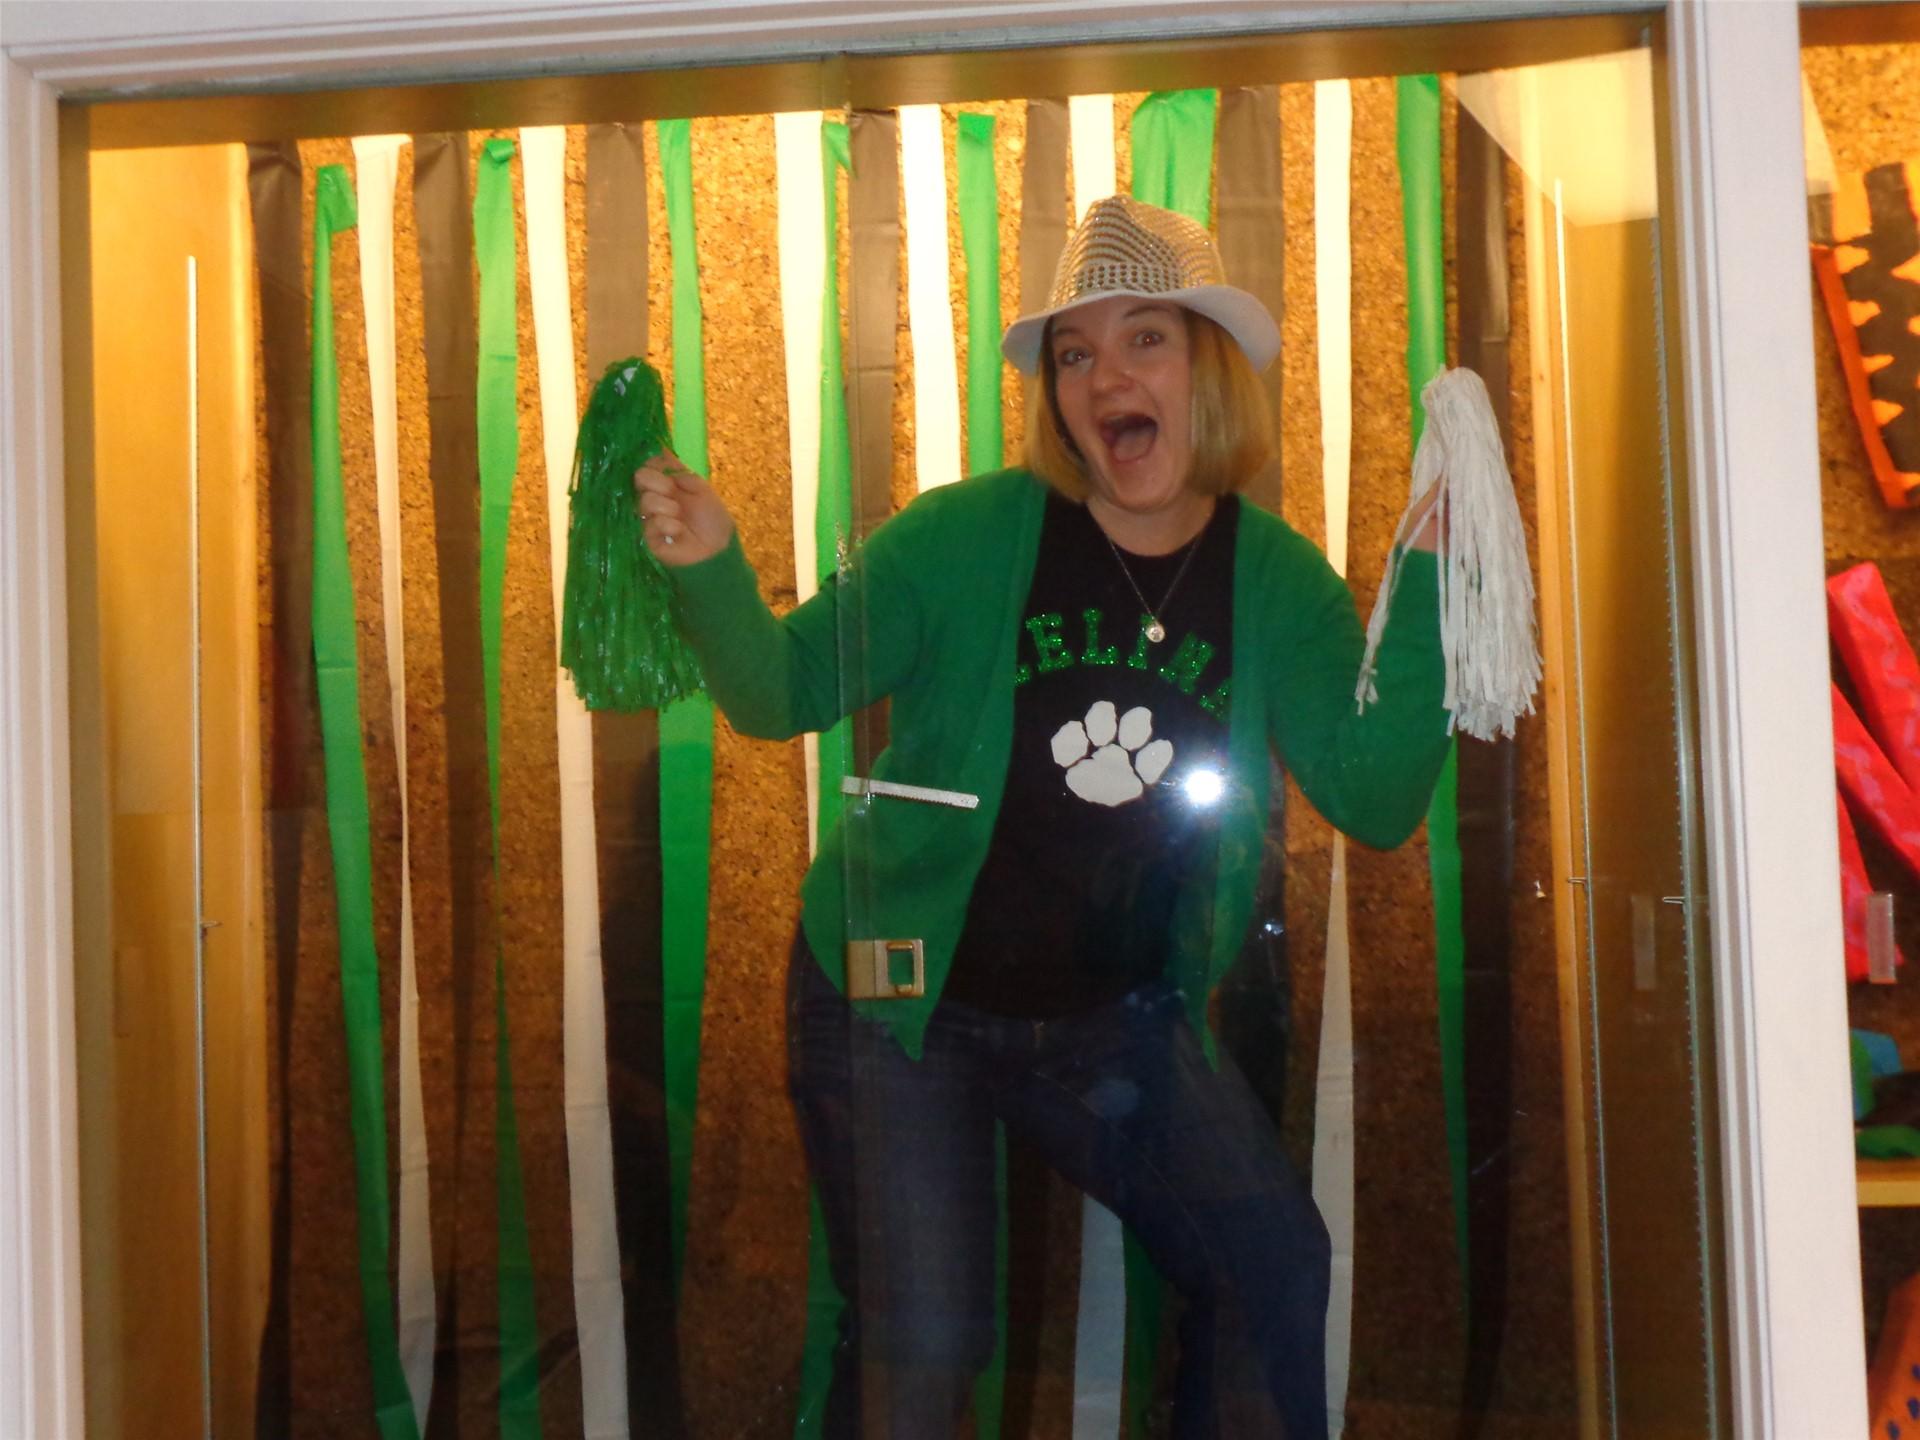 Fun Friday at Celina Elementary!